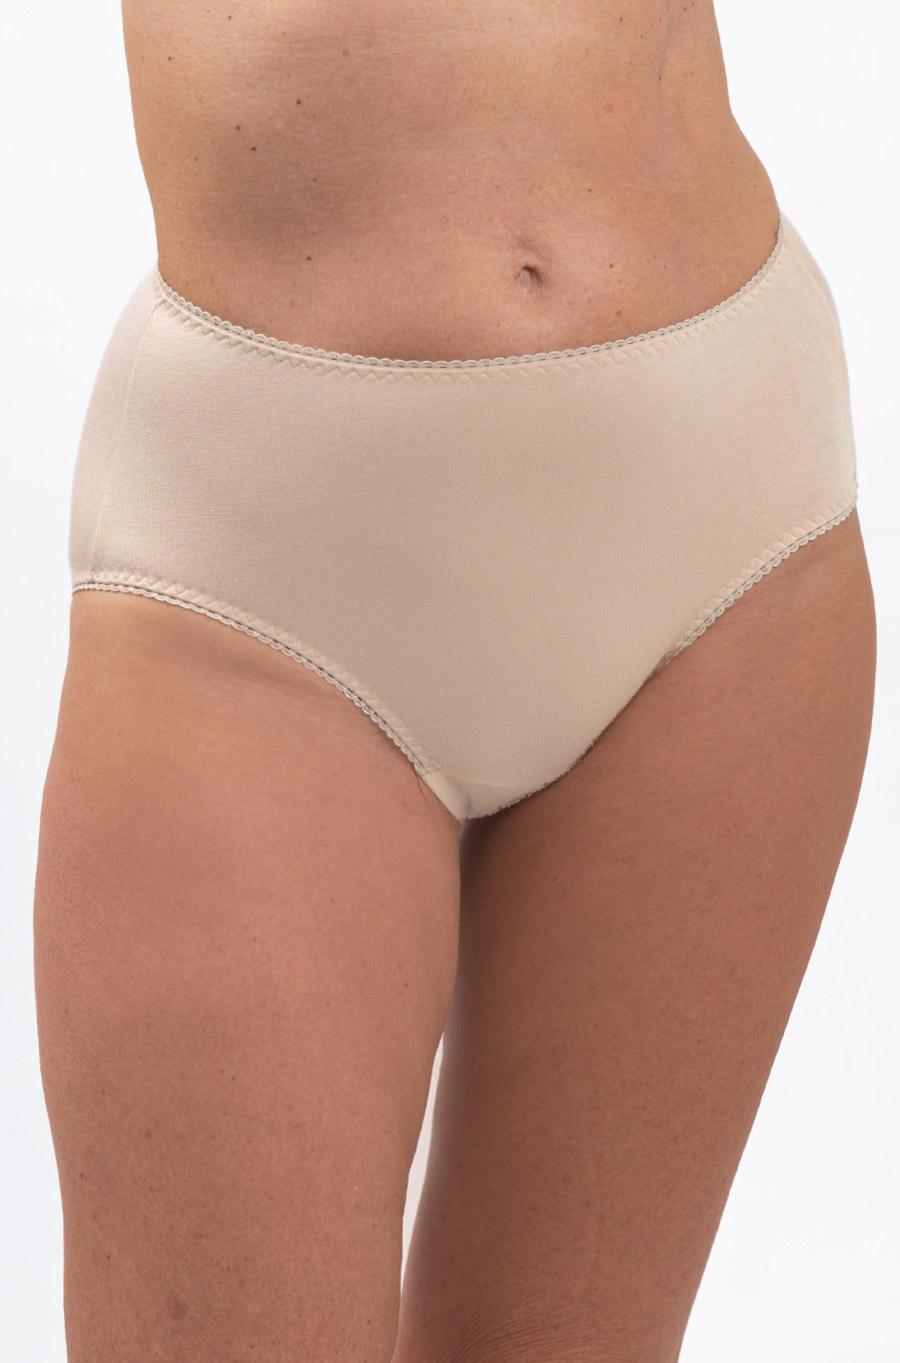 Brief Modal | Leakproof Underwear For Women